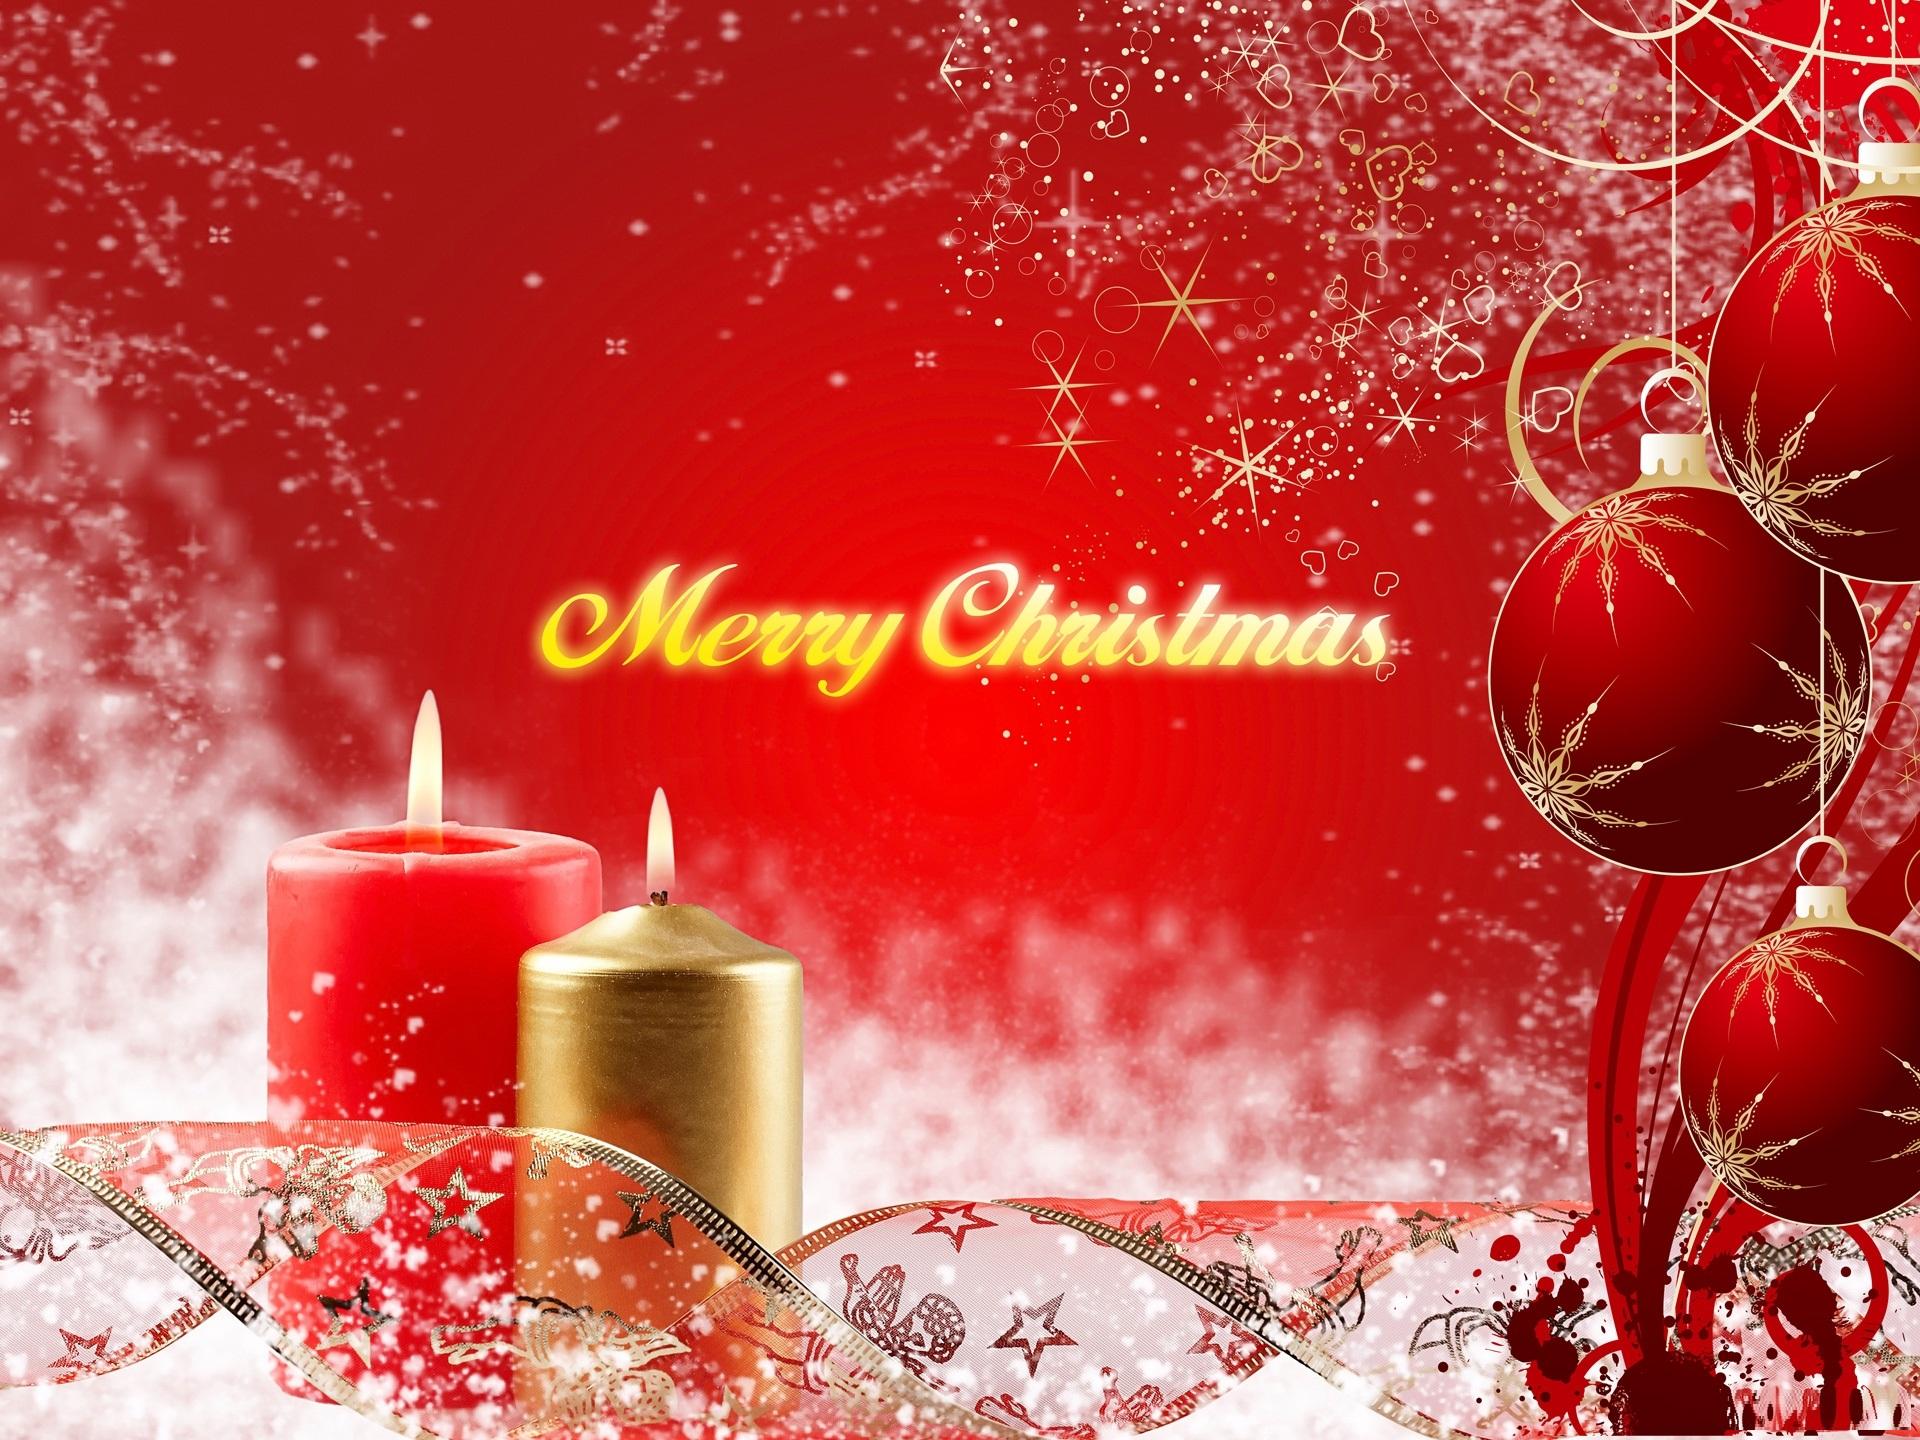 Christmas Wallpapers Hd Christmas Hd Wallpapers Widescreen 1920x1440